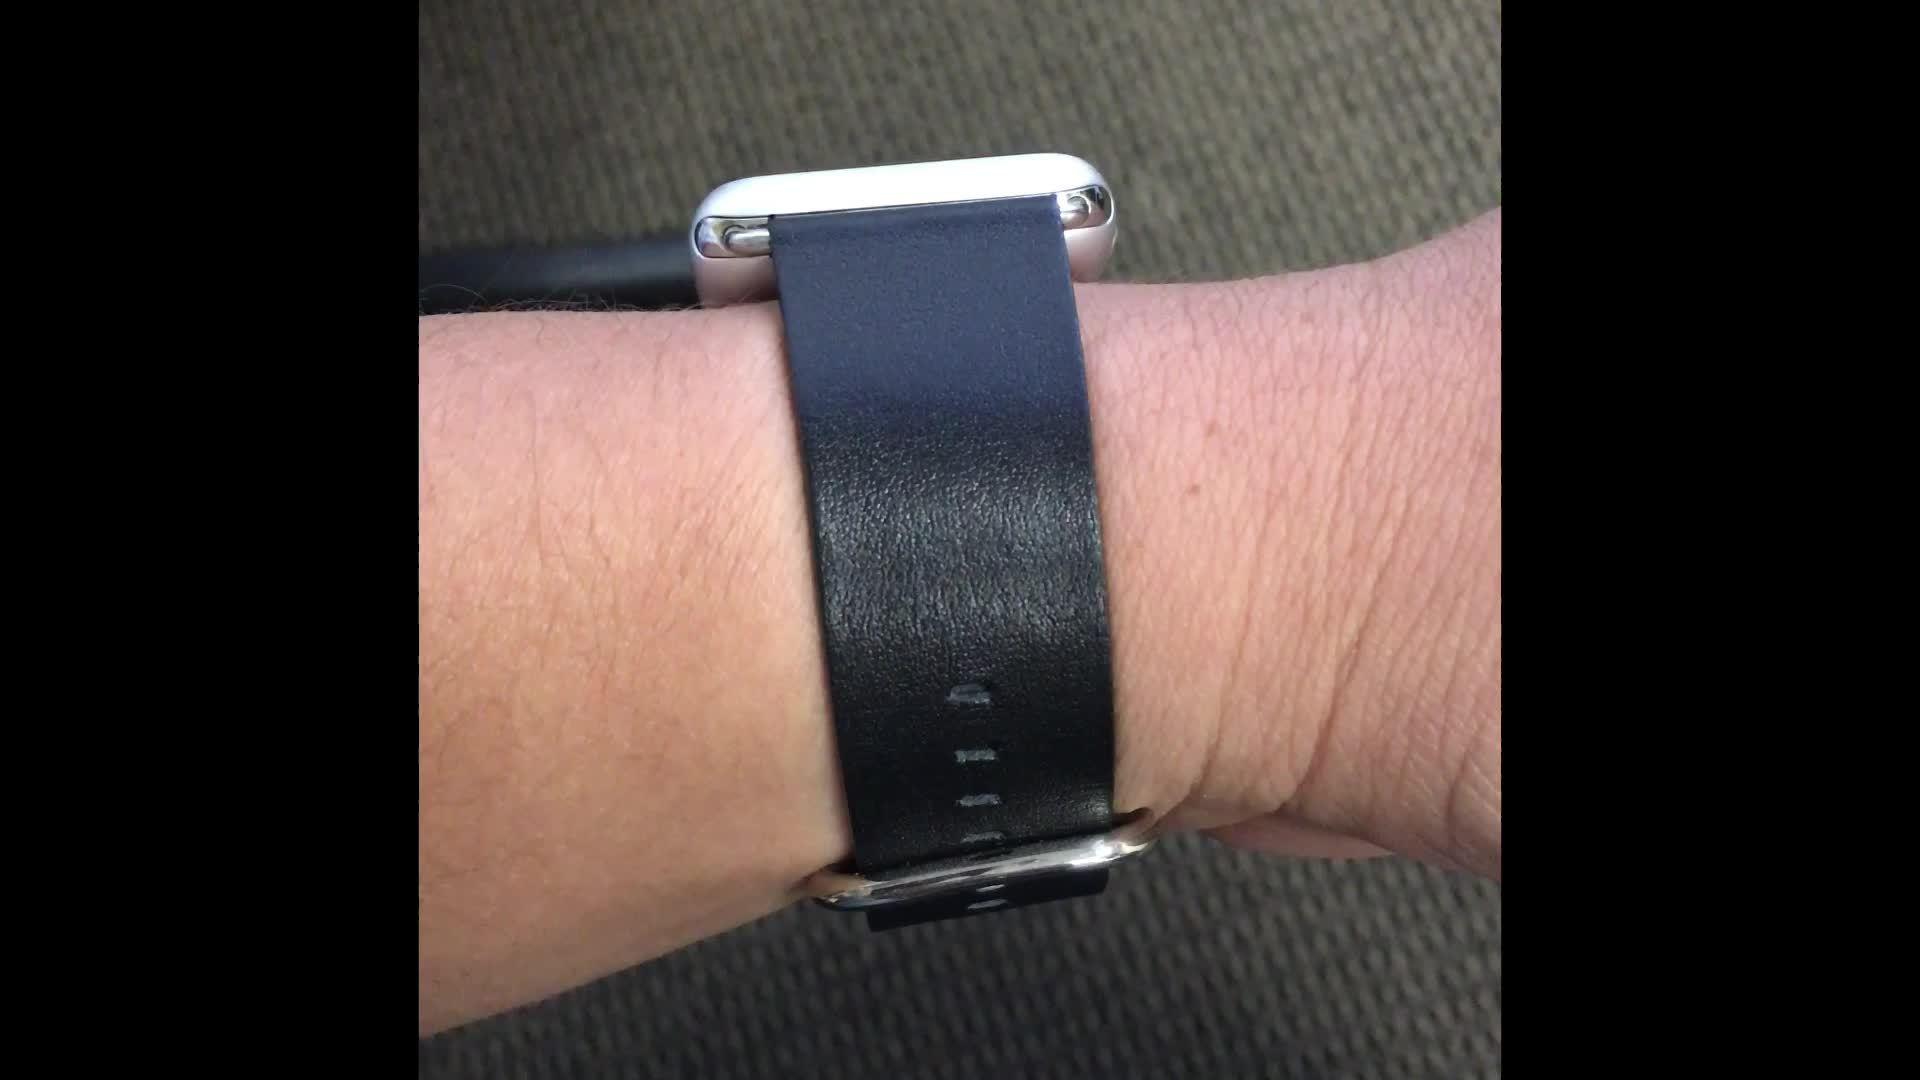 applewatch, dezign999, live photo, Dezign999's Apple Watch GIFs